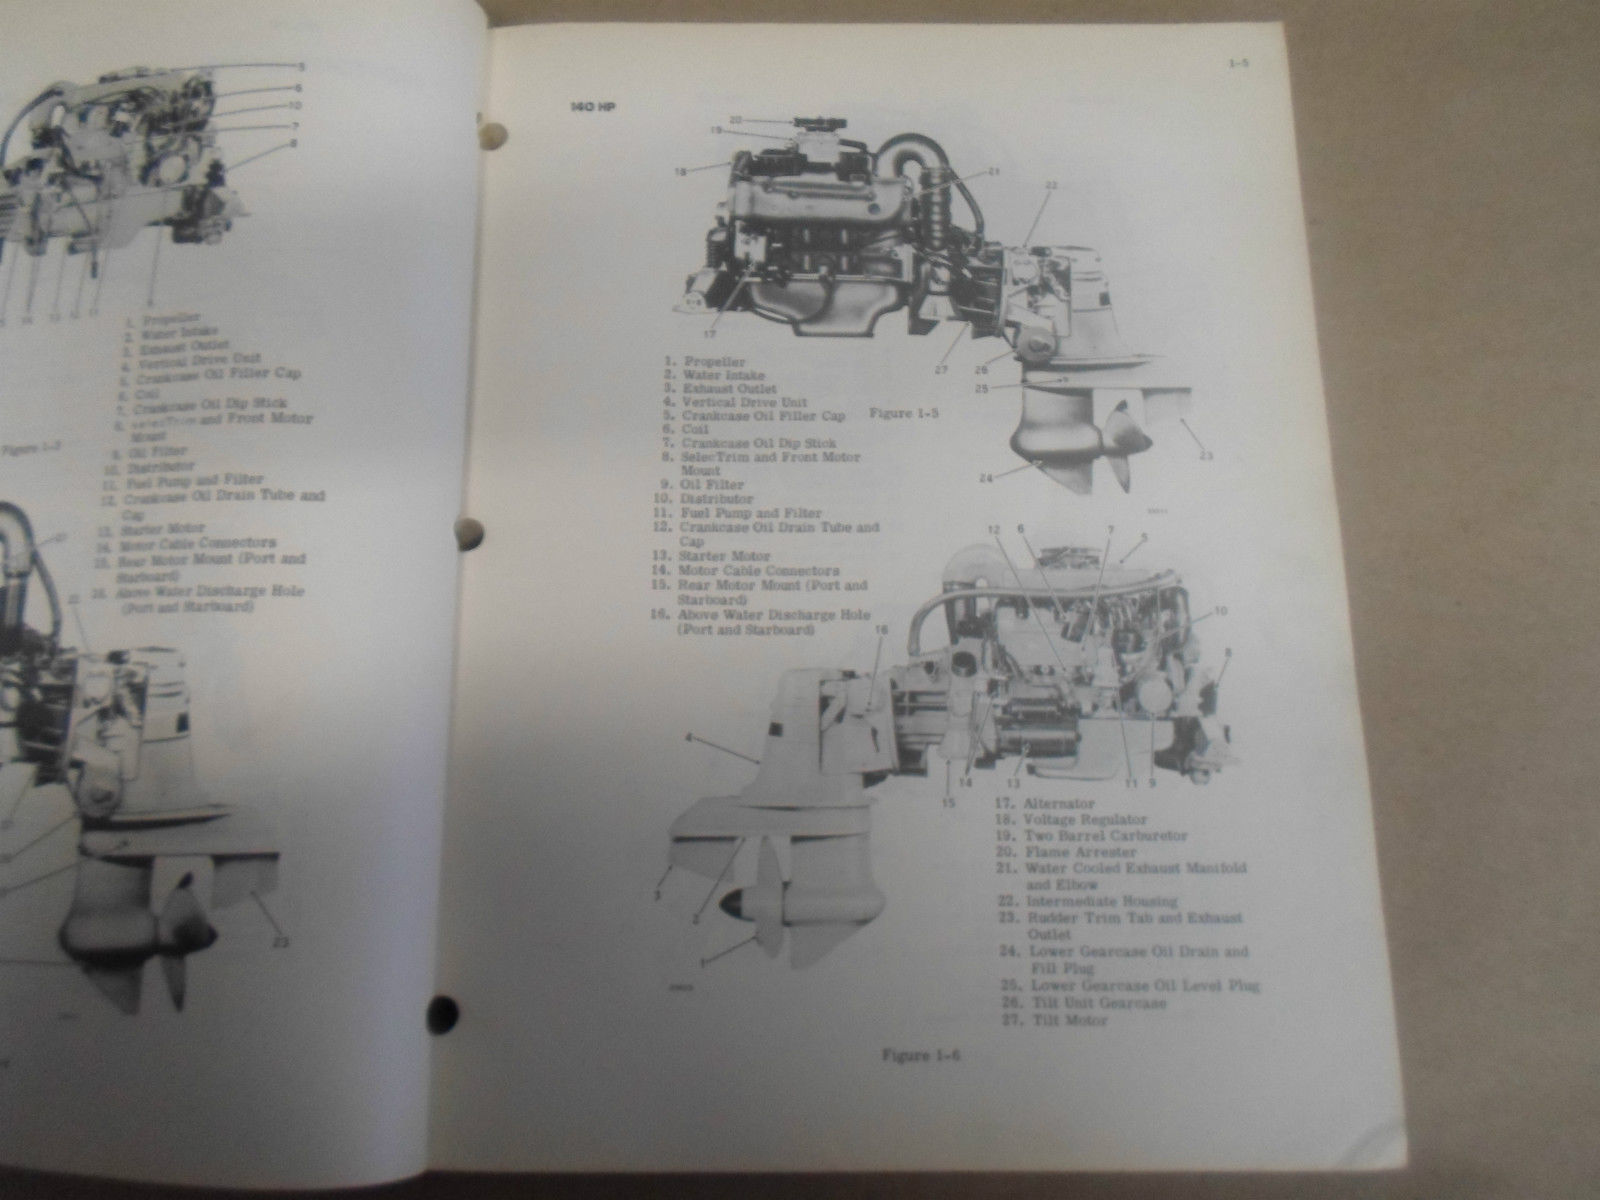 1973 Omc Shop Reparatur Service Manuell 100 120 165 225 245 hp 980249 OEM Boot